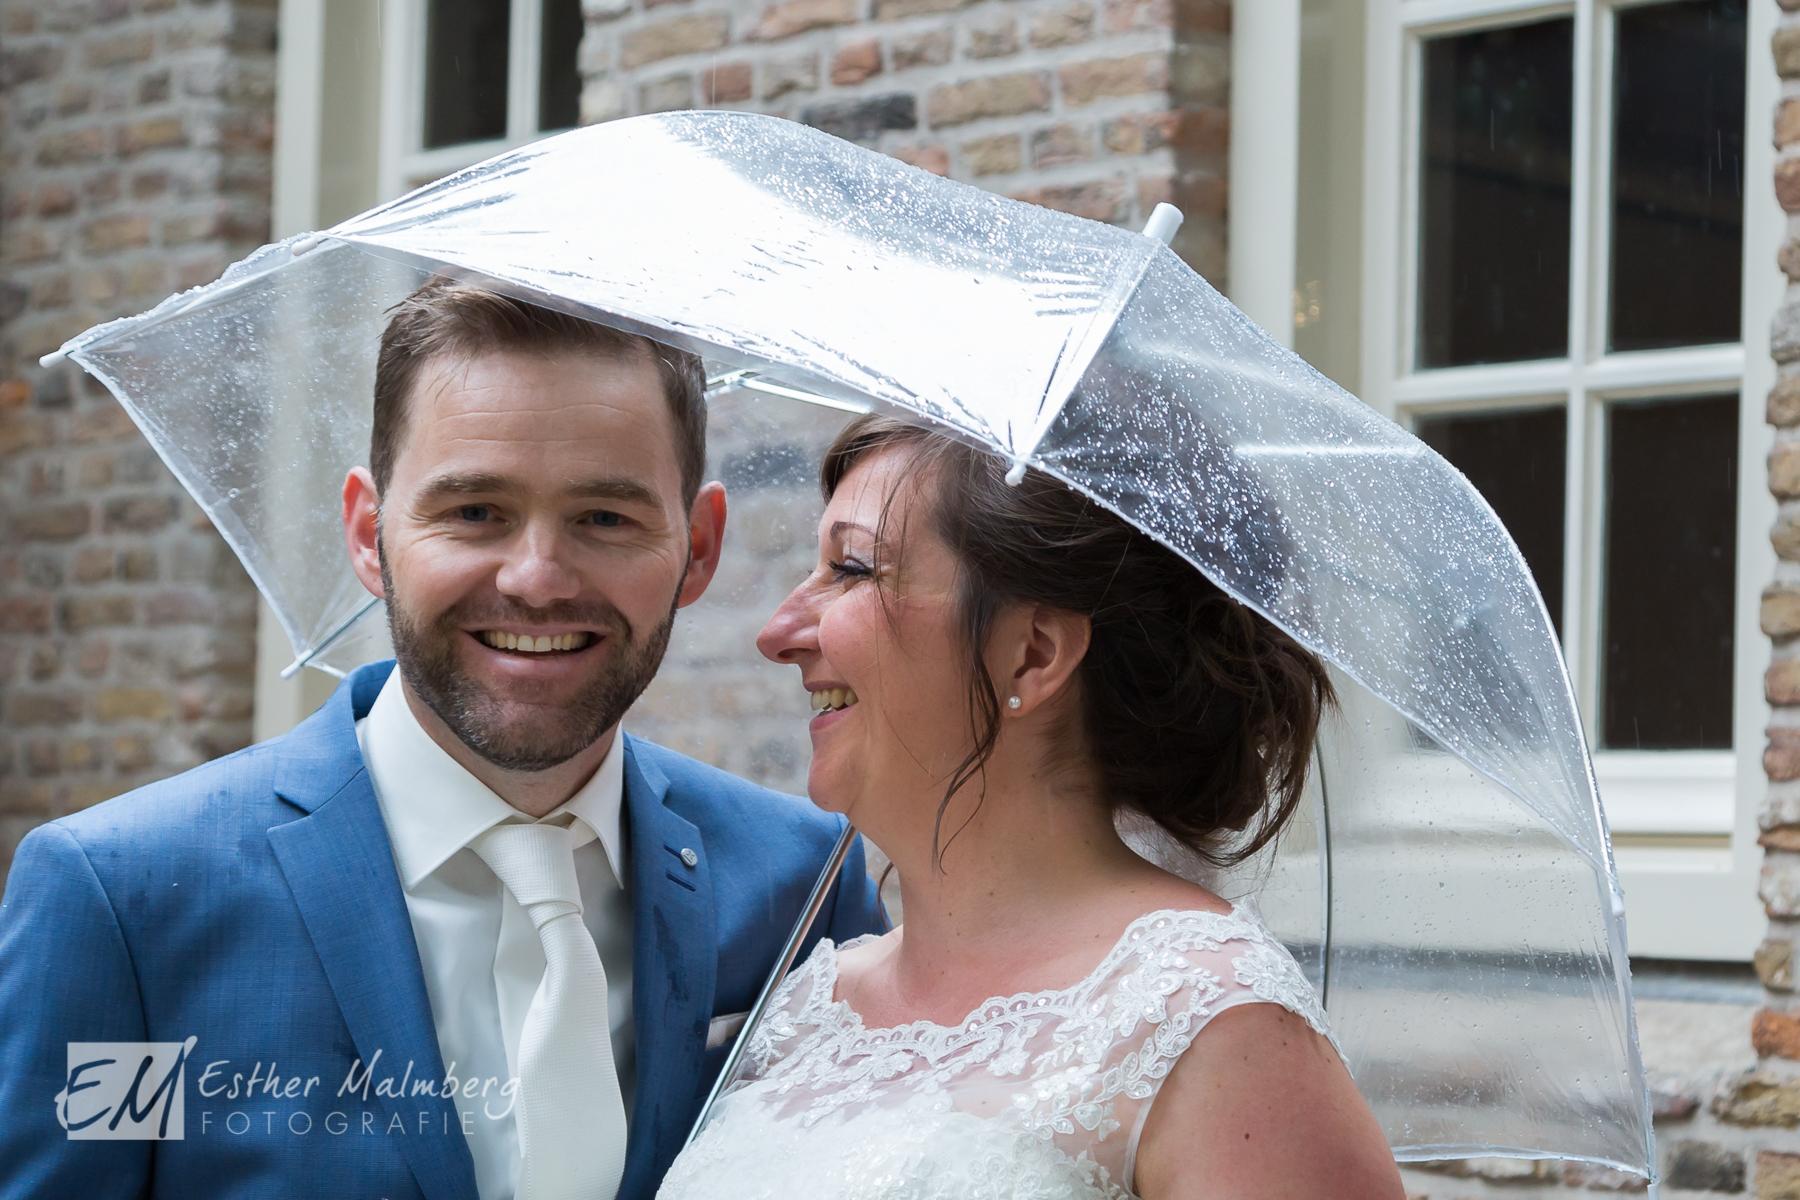 Plezier en ontspanning tijdens bruidsreportage museumtuin Gouda Esther Malmberg Fotografie